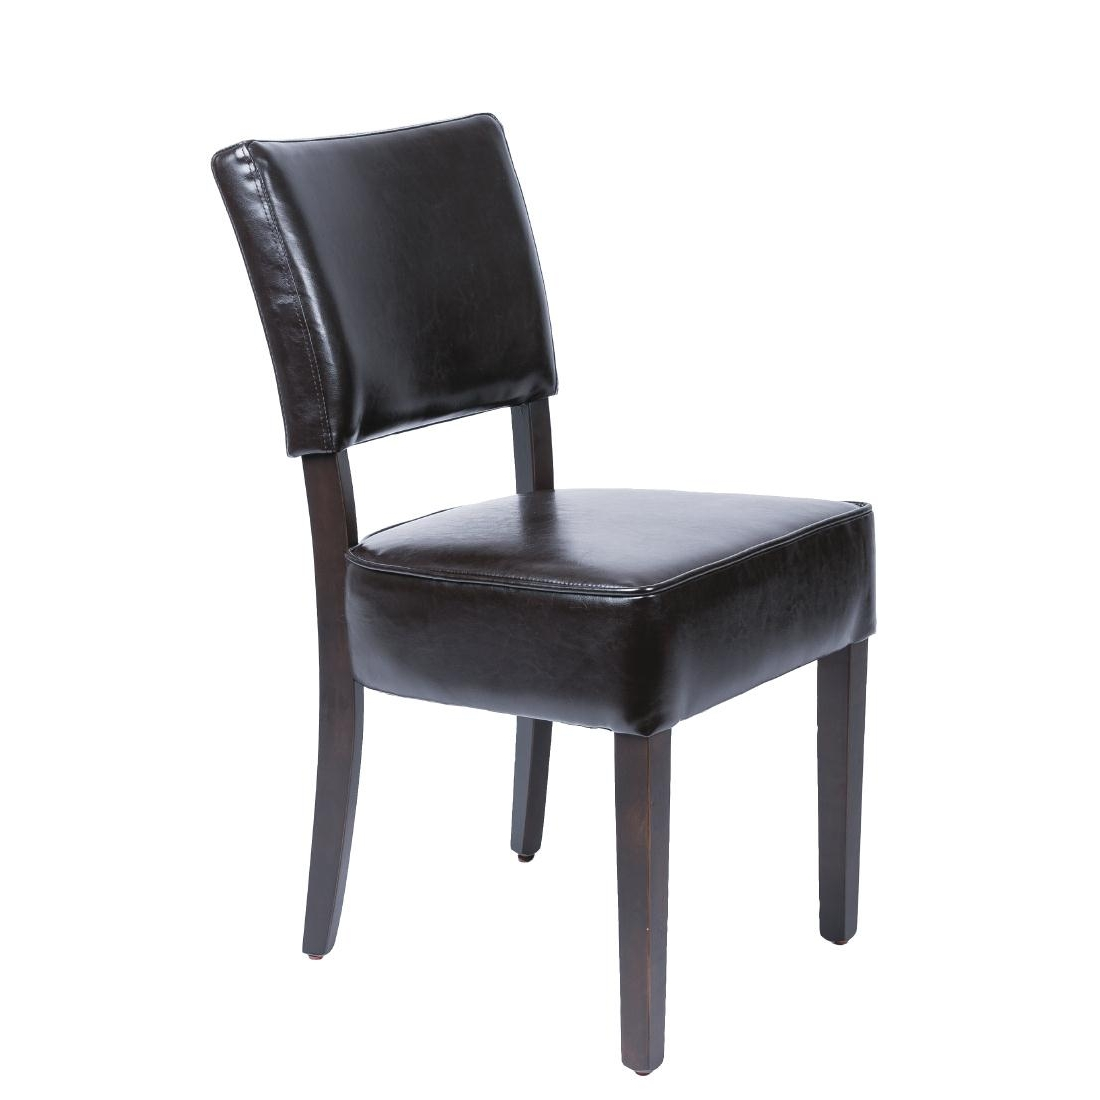 Chaises confortables en simili cuir Bolero marron foncé